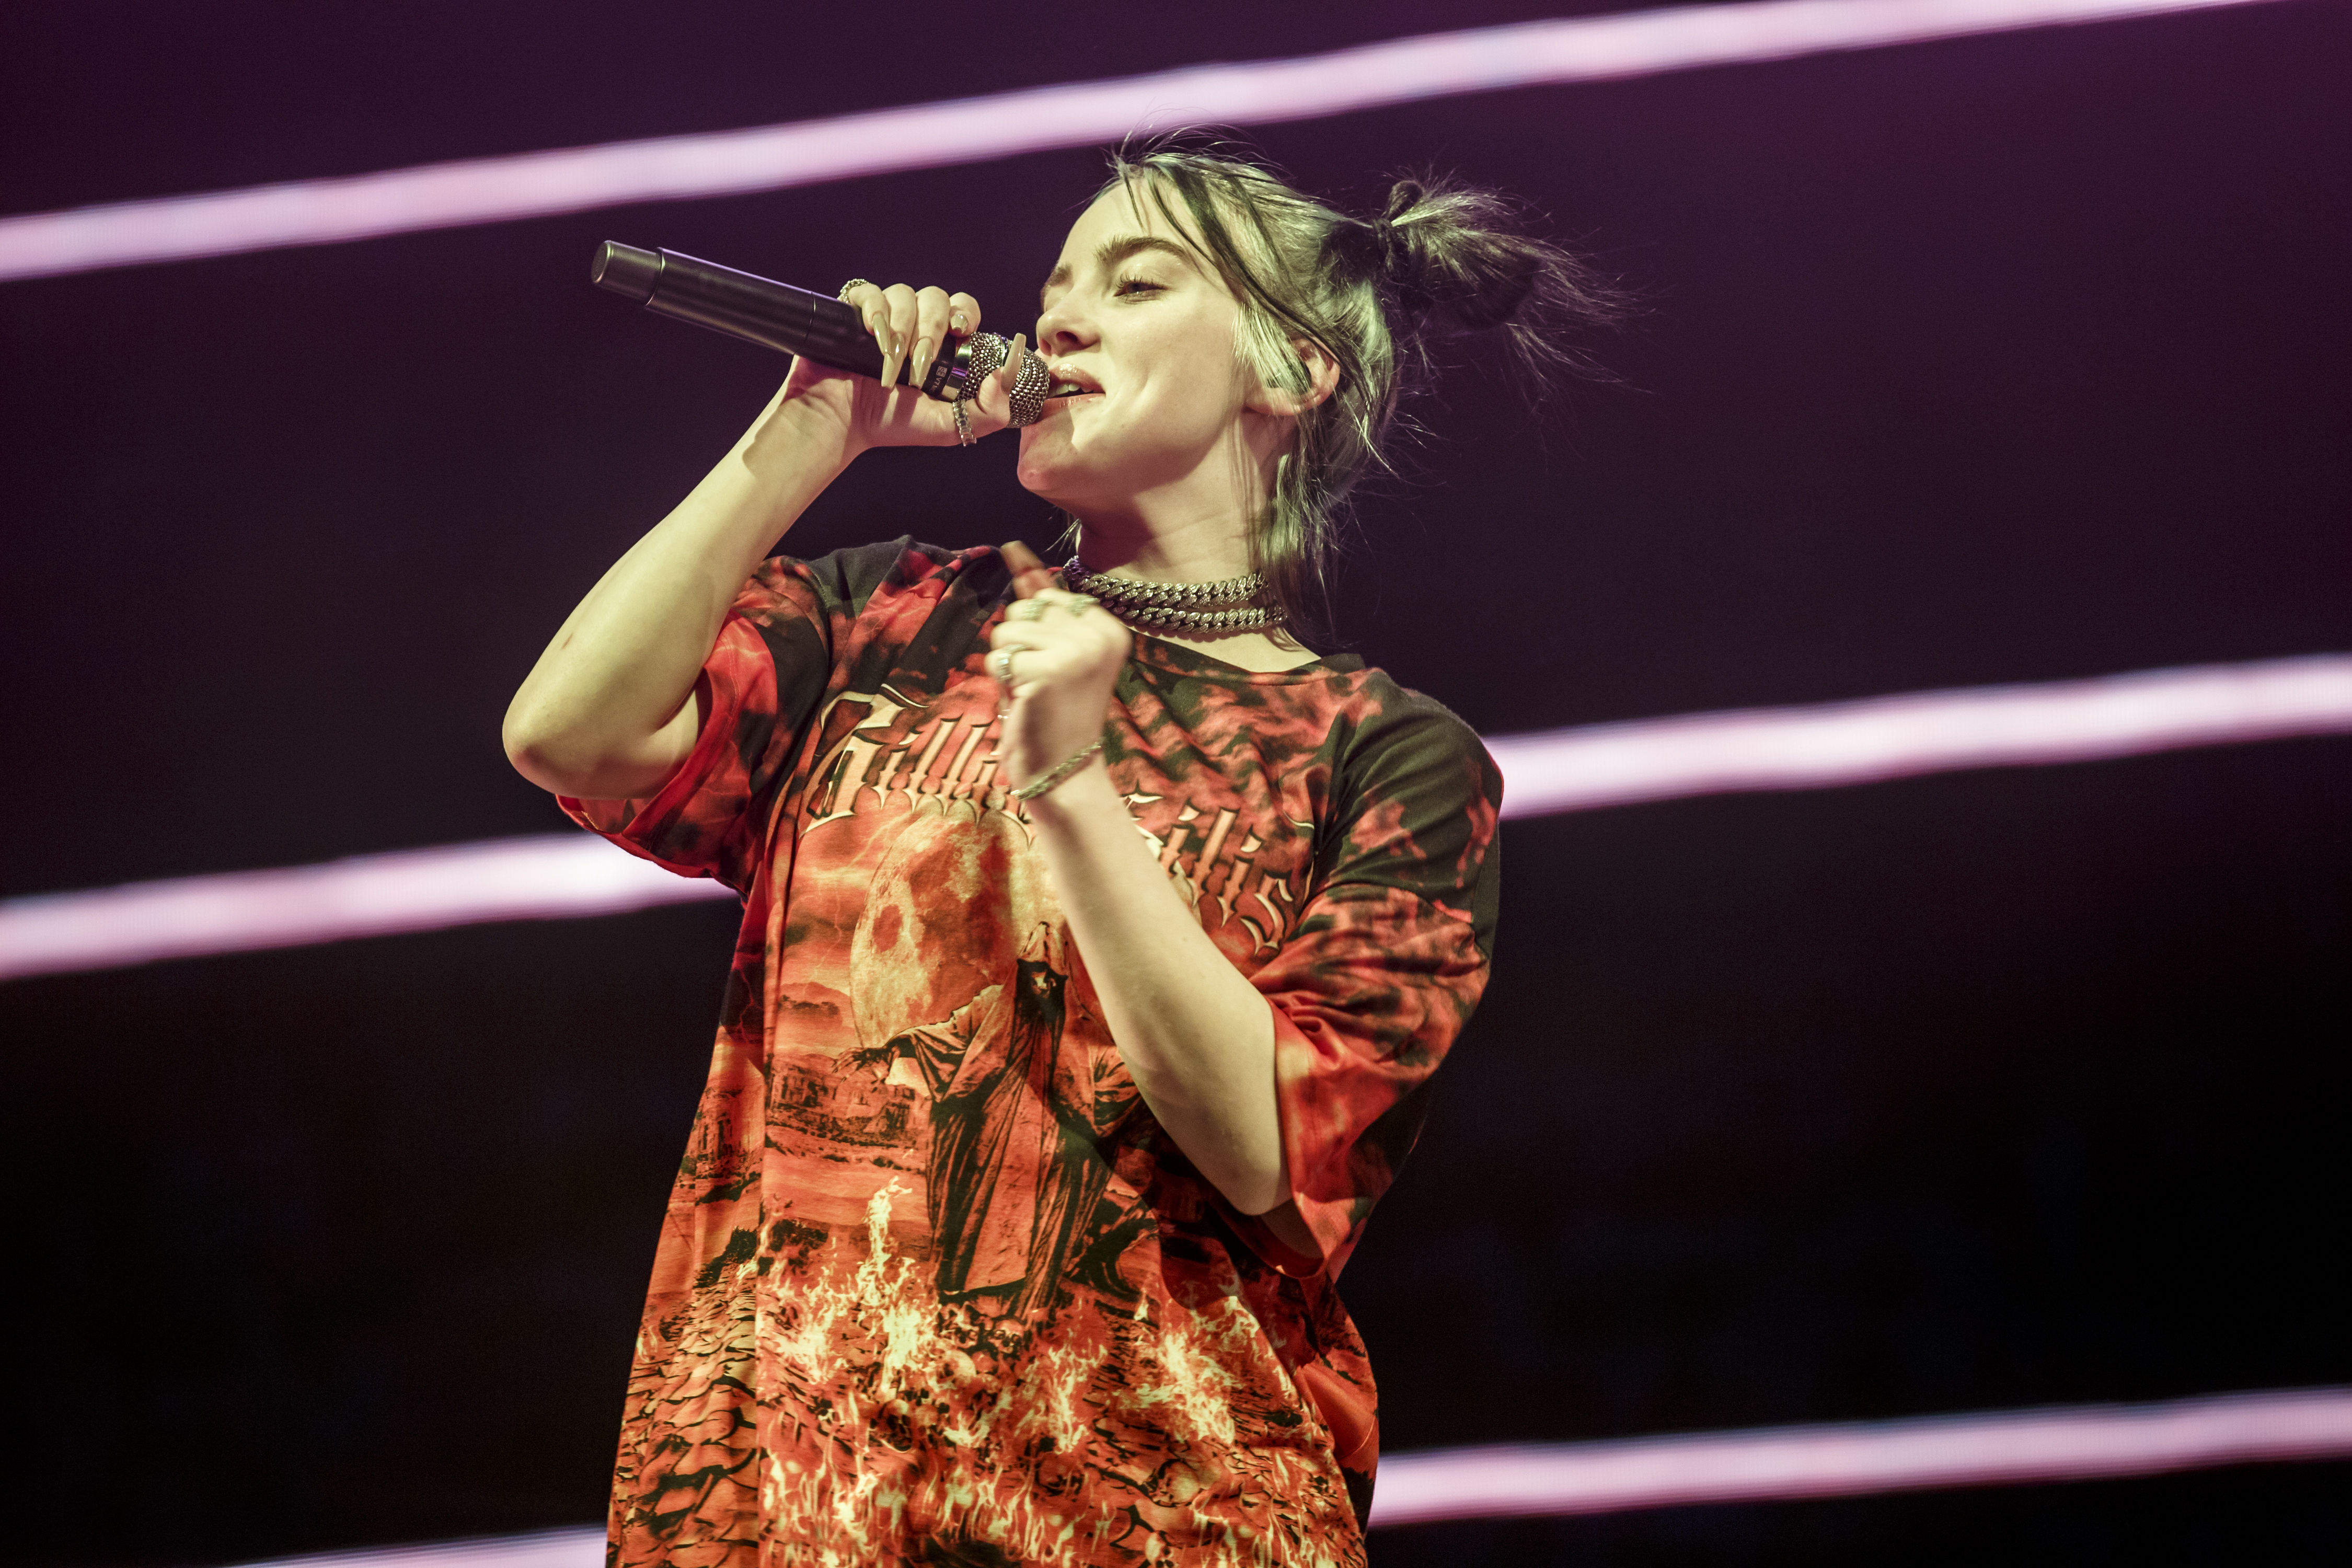 BARCELONA, SPAIN - SEPTEMBER 02: Billie Eilish performs in concert at Palau Sant Jordi on September 02, 2019 in Barcelona, Spain. (Photo by Xavi Torrent/Redferns)